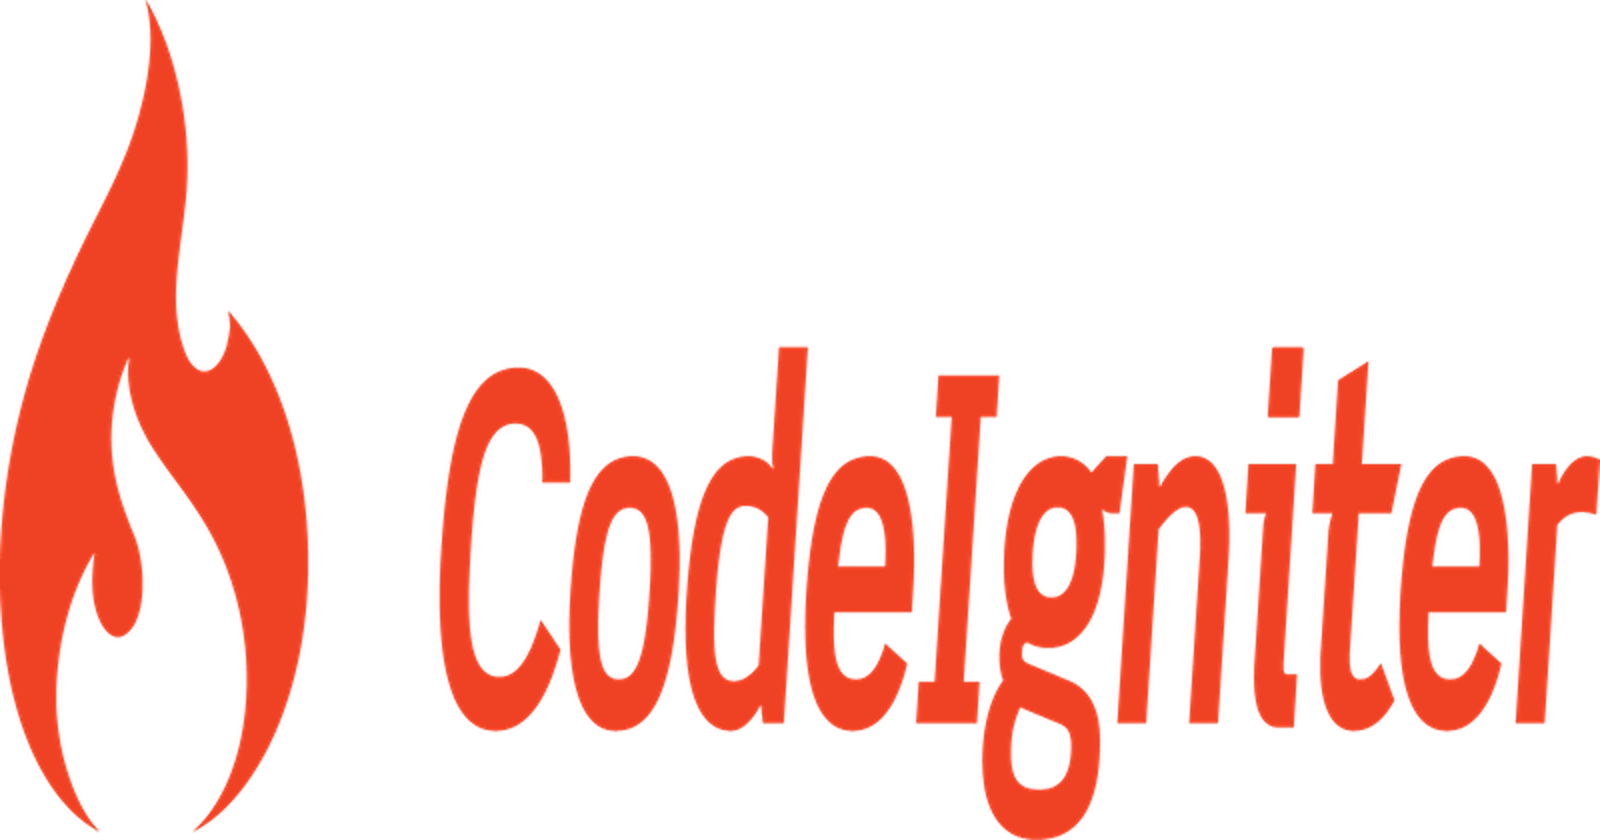 Extending Bonfires User system or EAV Users and PHP Development